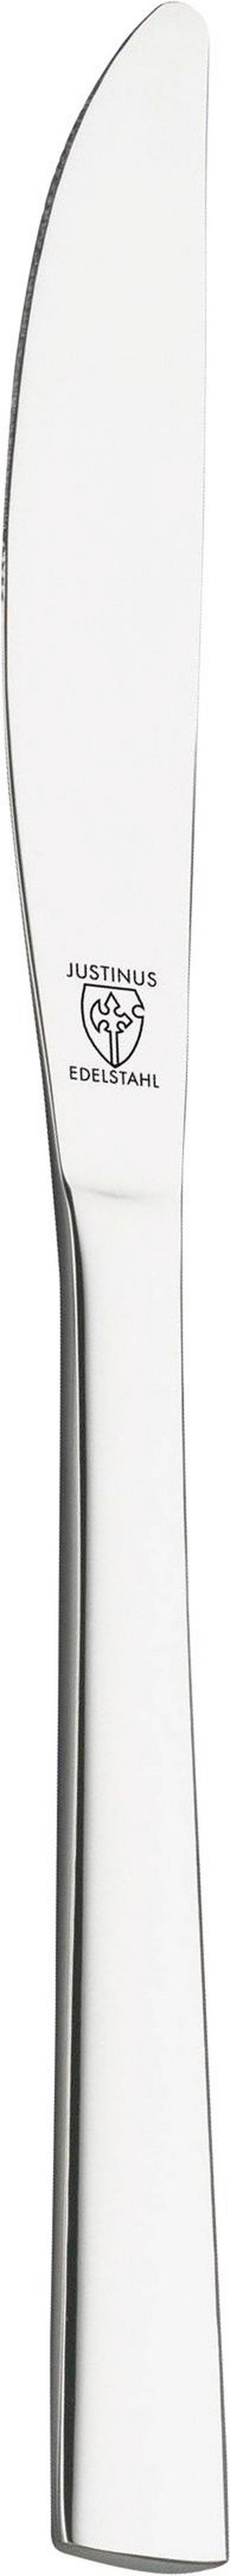 MESSER - Silberfarben, Basics, Metall (22.6/0.19/0.07cm) - JUSTINUS